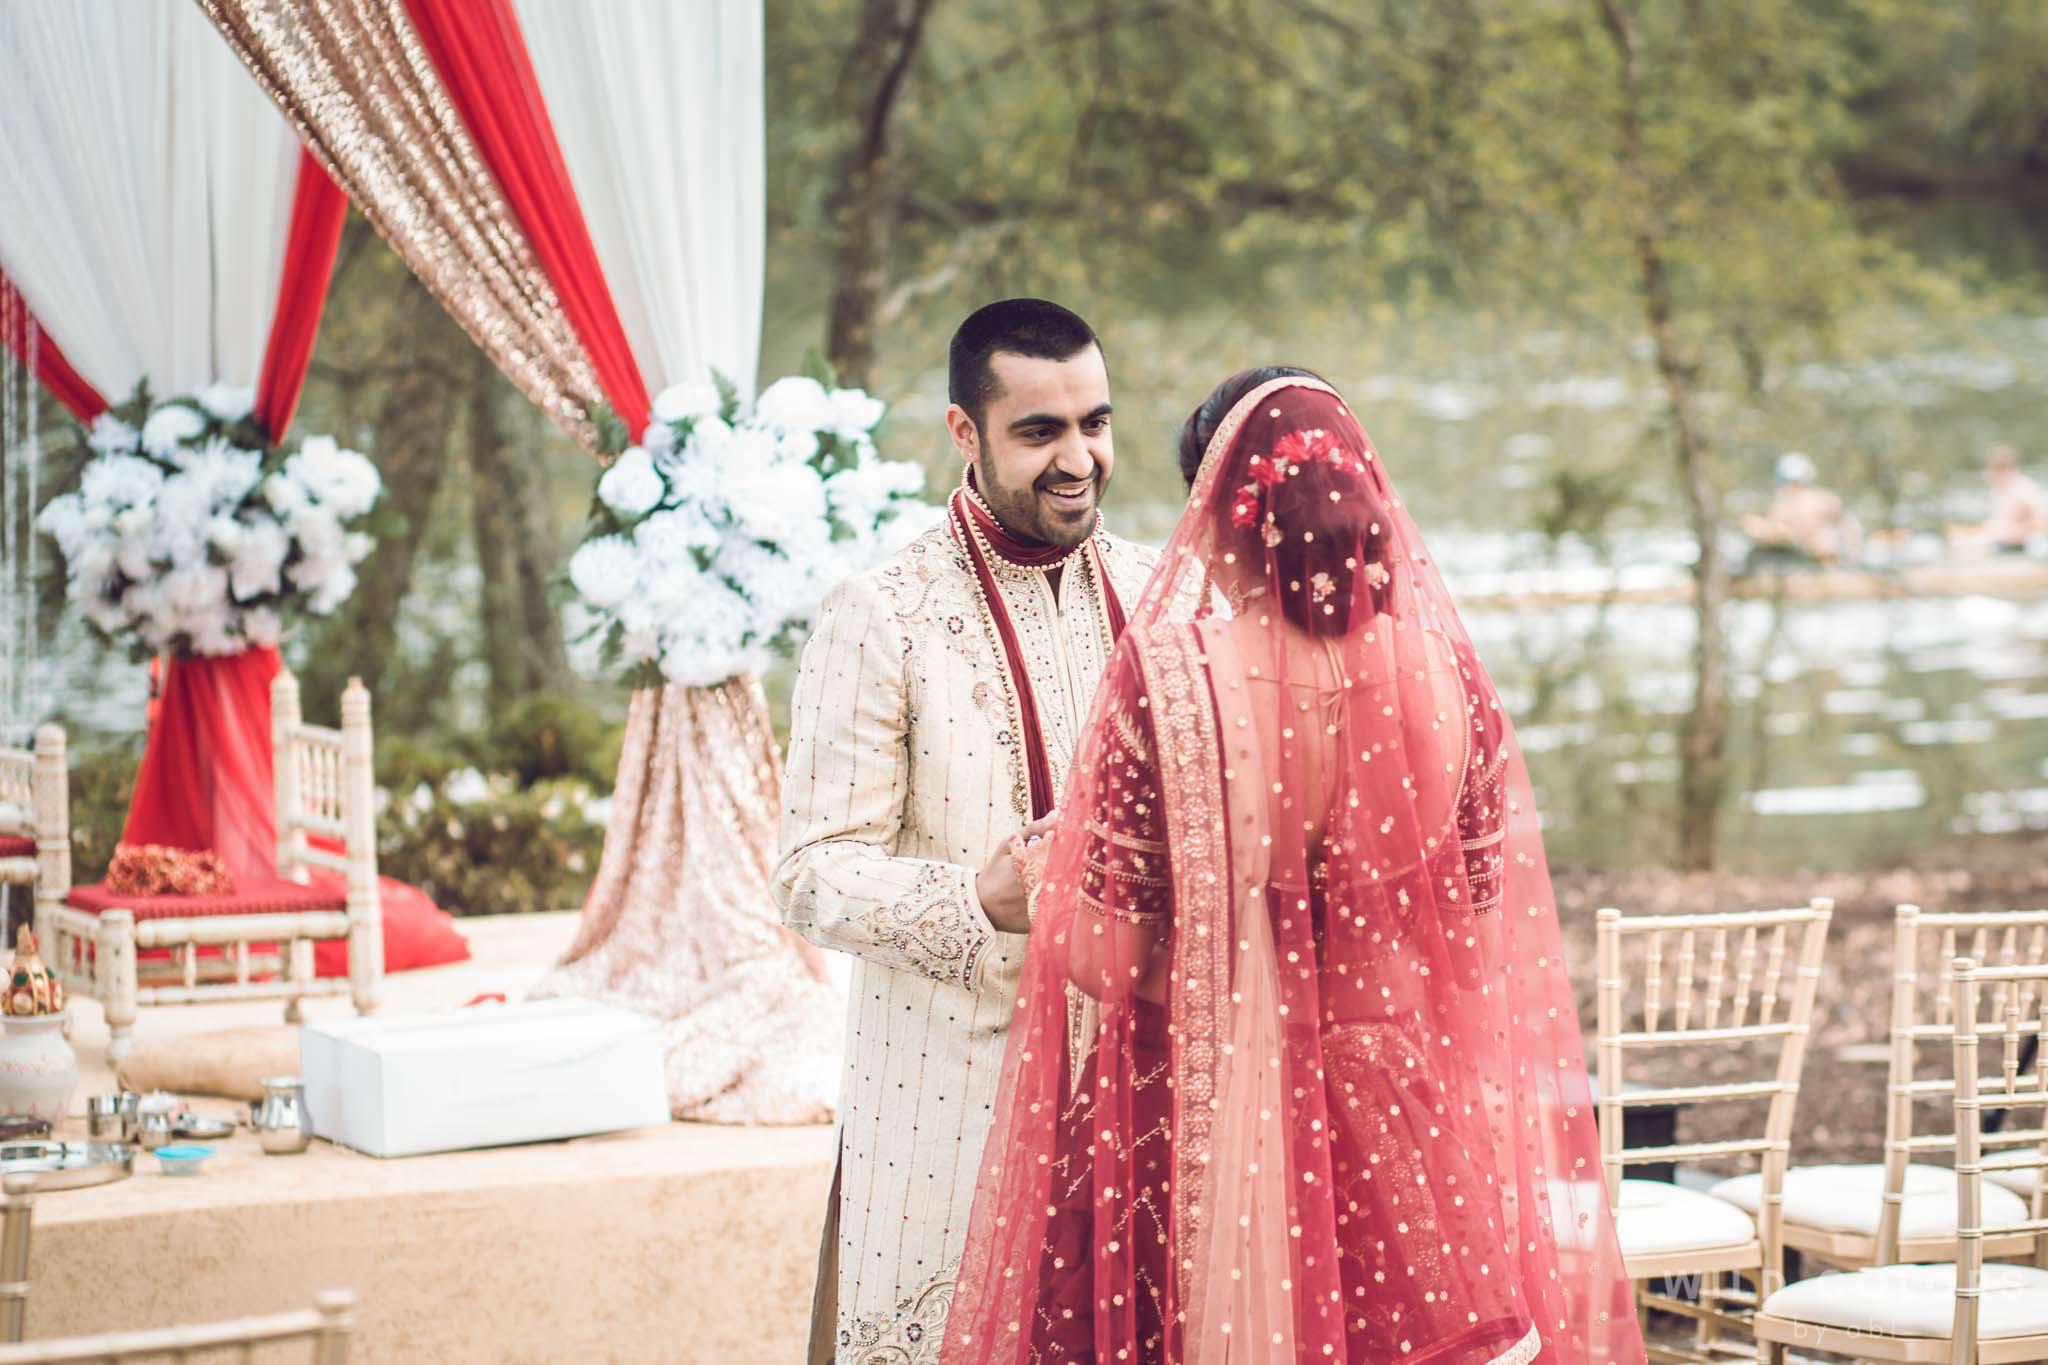 CANDID_INDIAN_WEDDING_ATLANTA_PHOTOGRAPHER-20.JPG